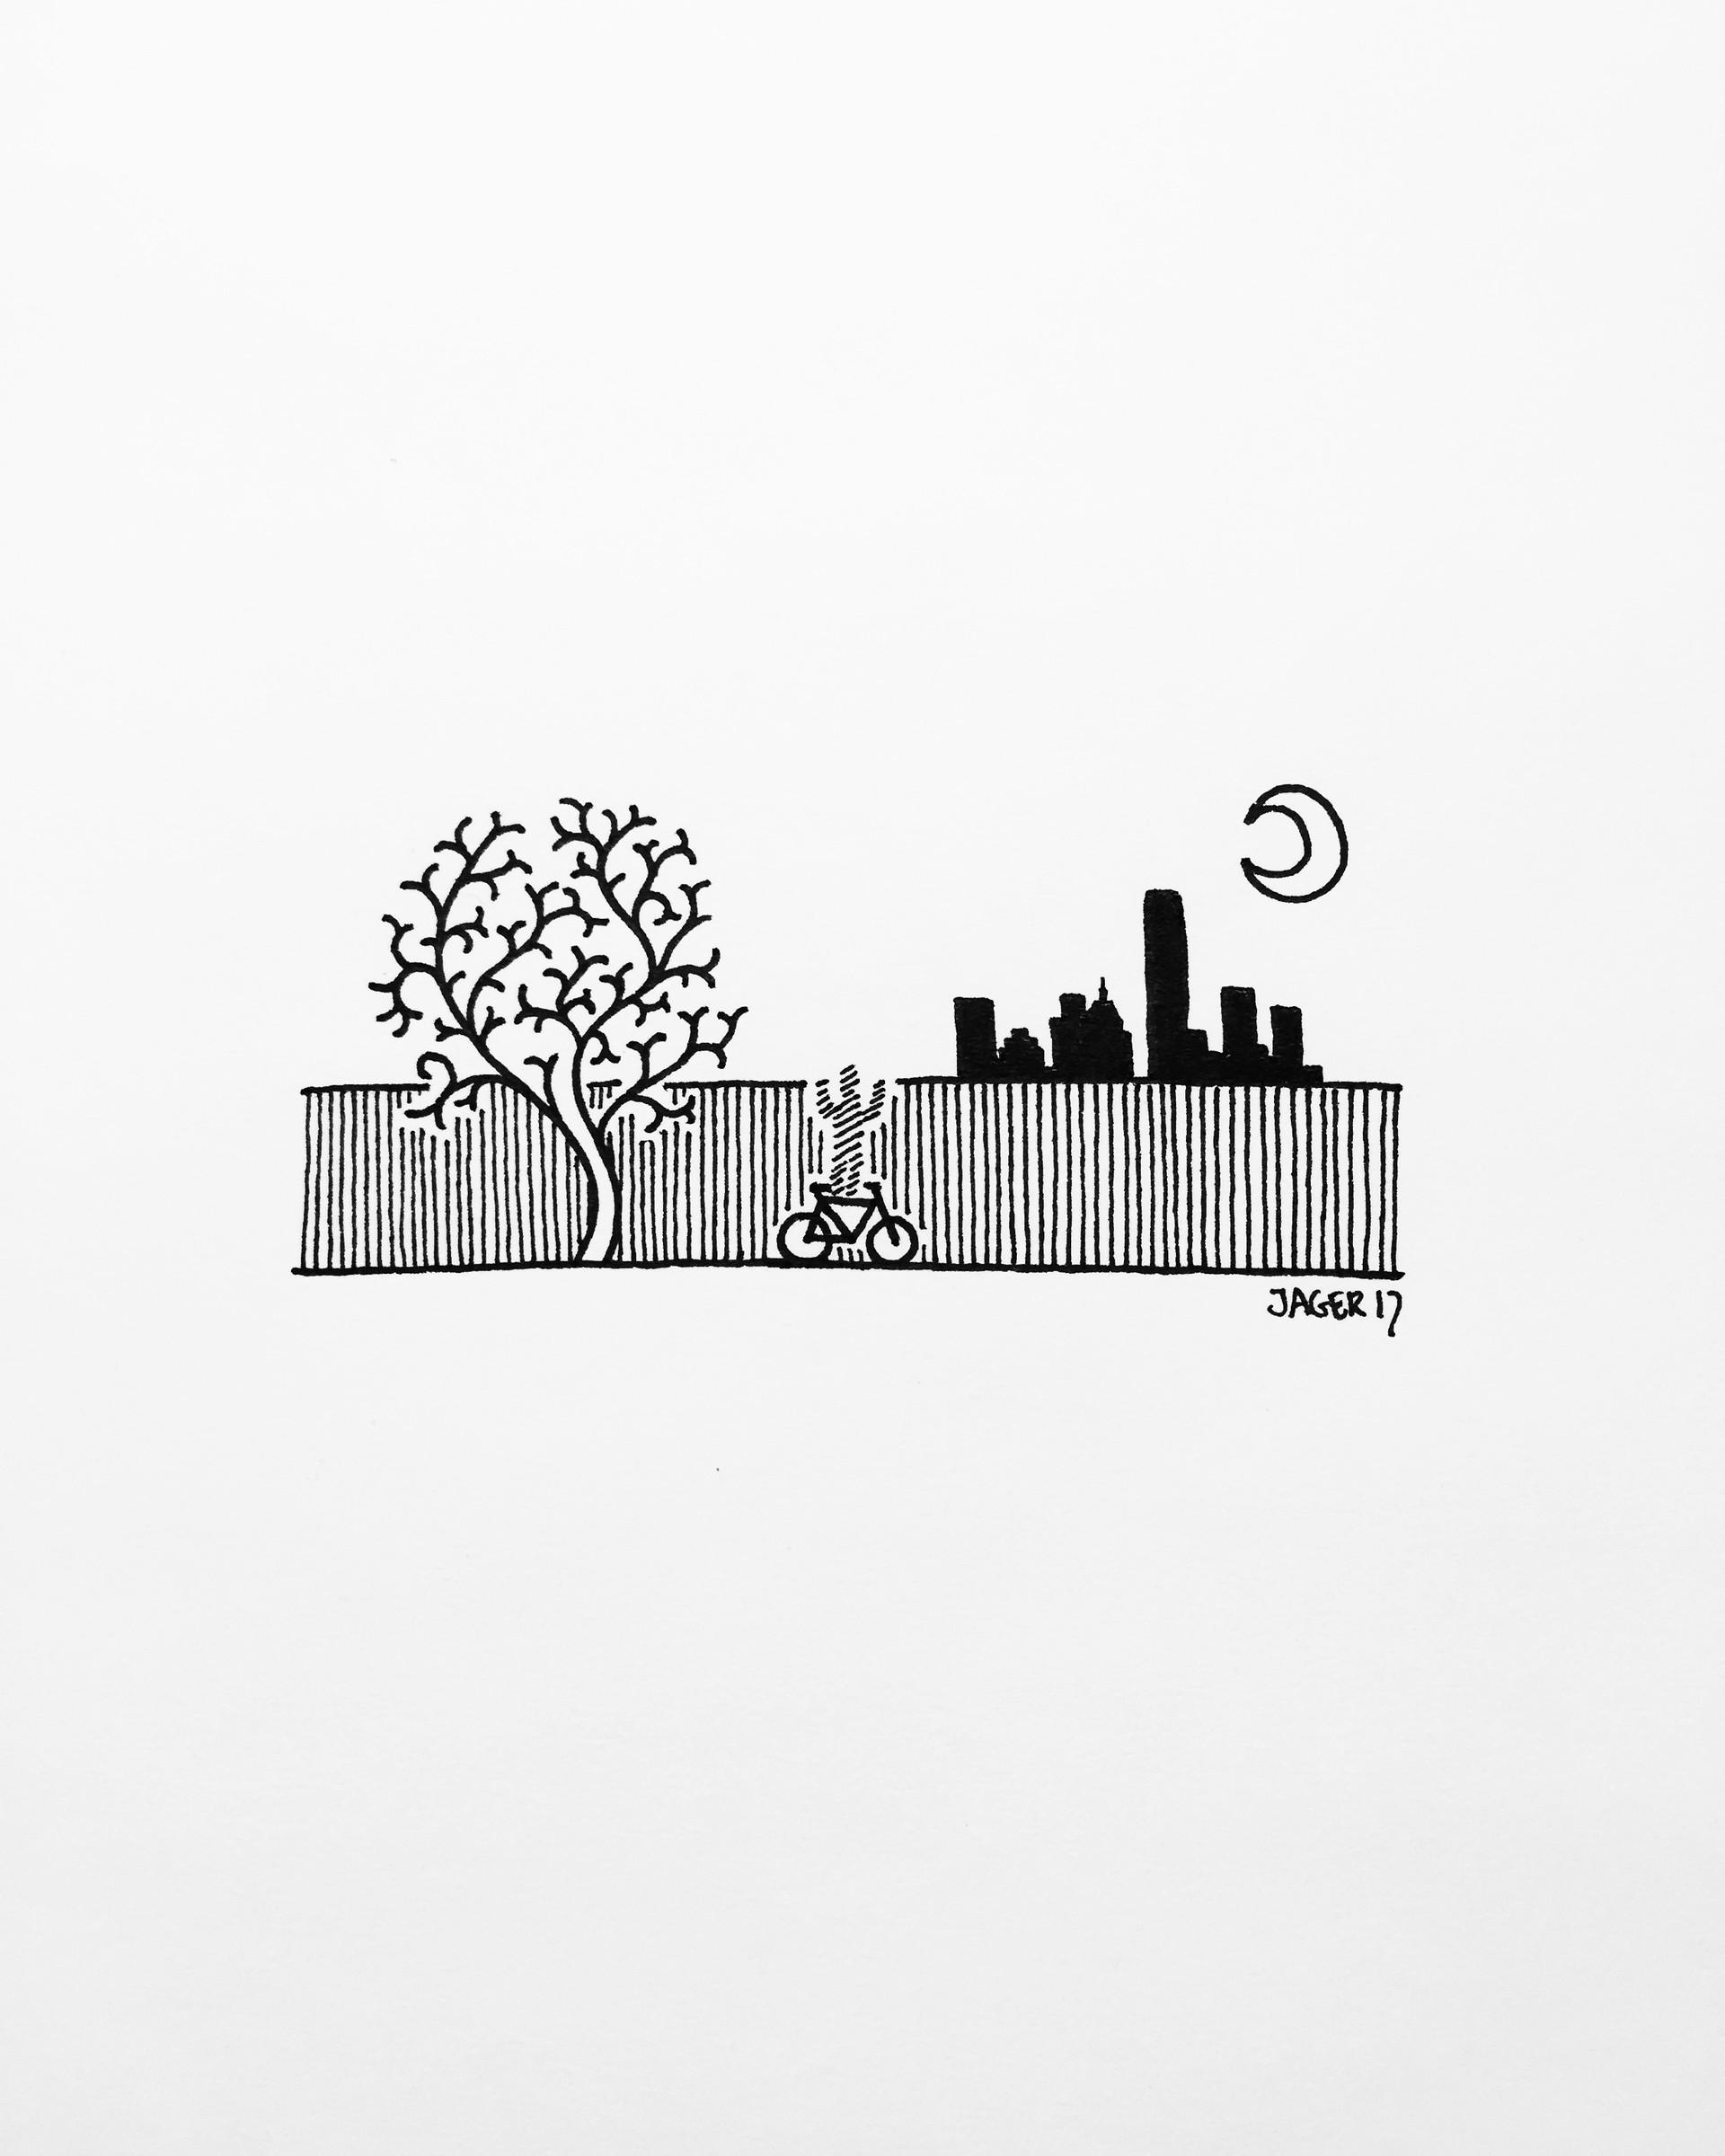 Skyline Peeking